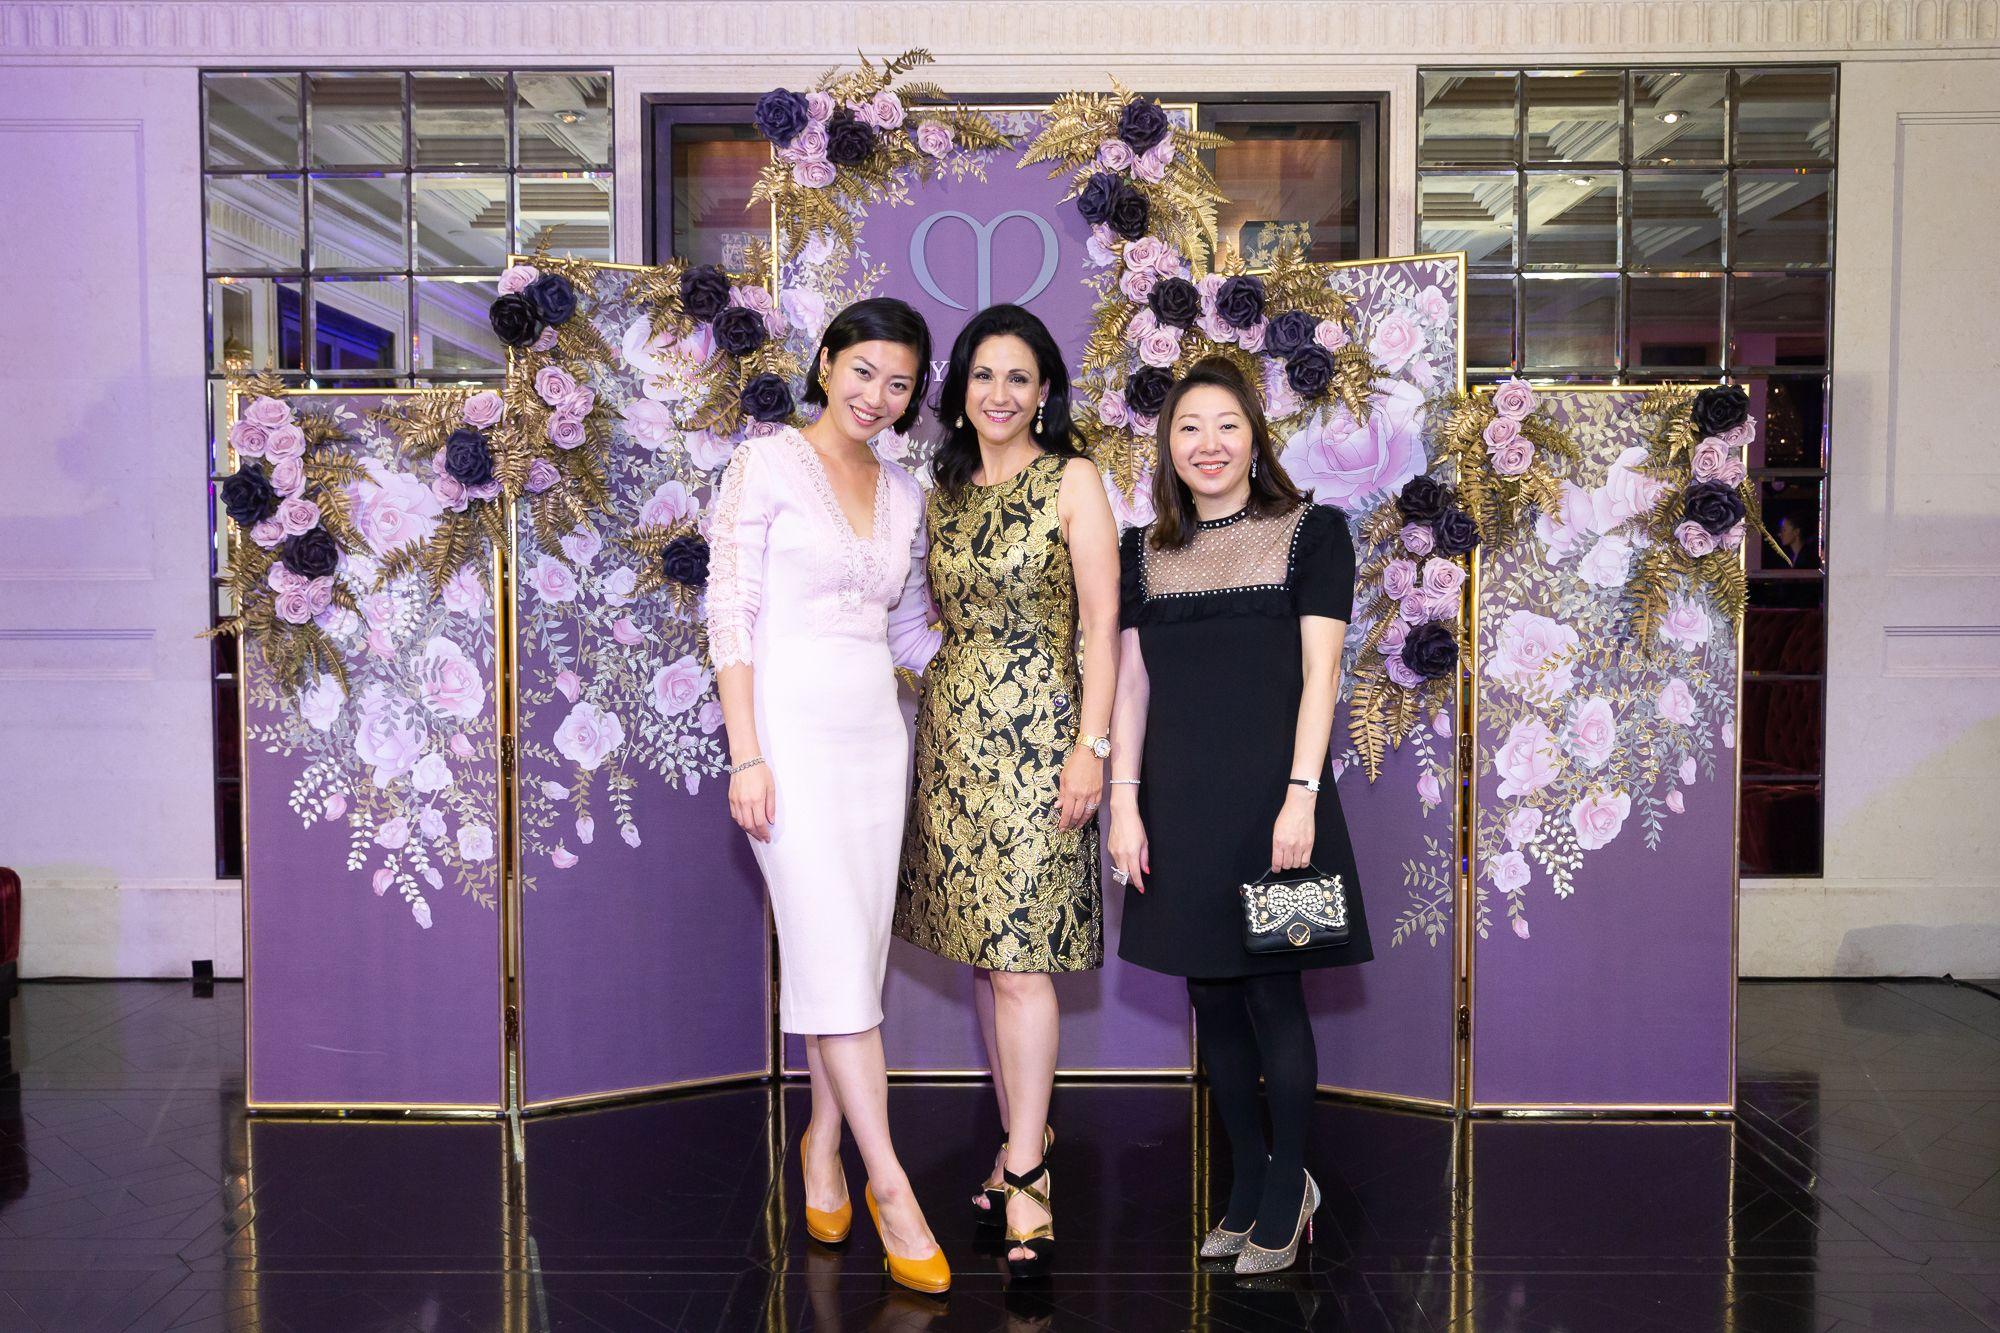 Laura Cheung, Mahnaz Lee, Winnie Chan